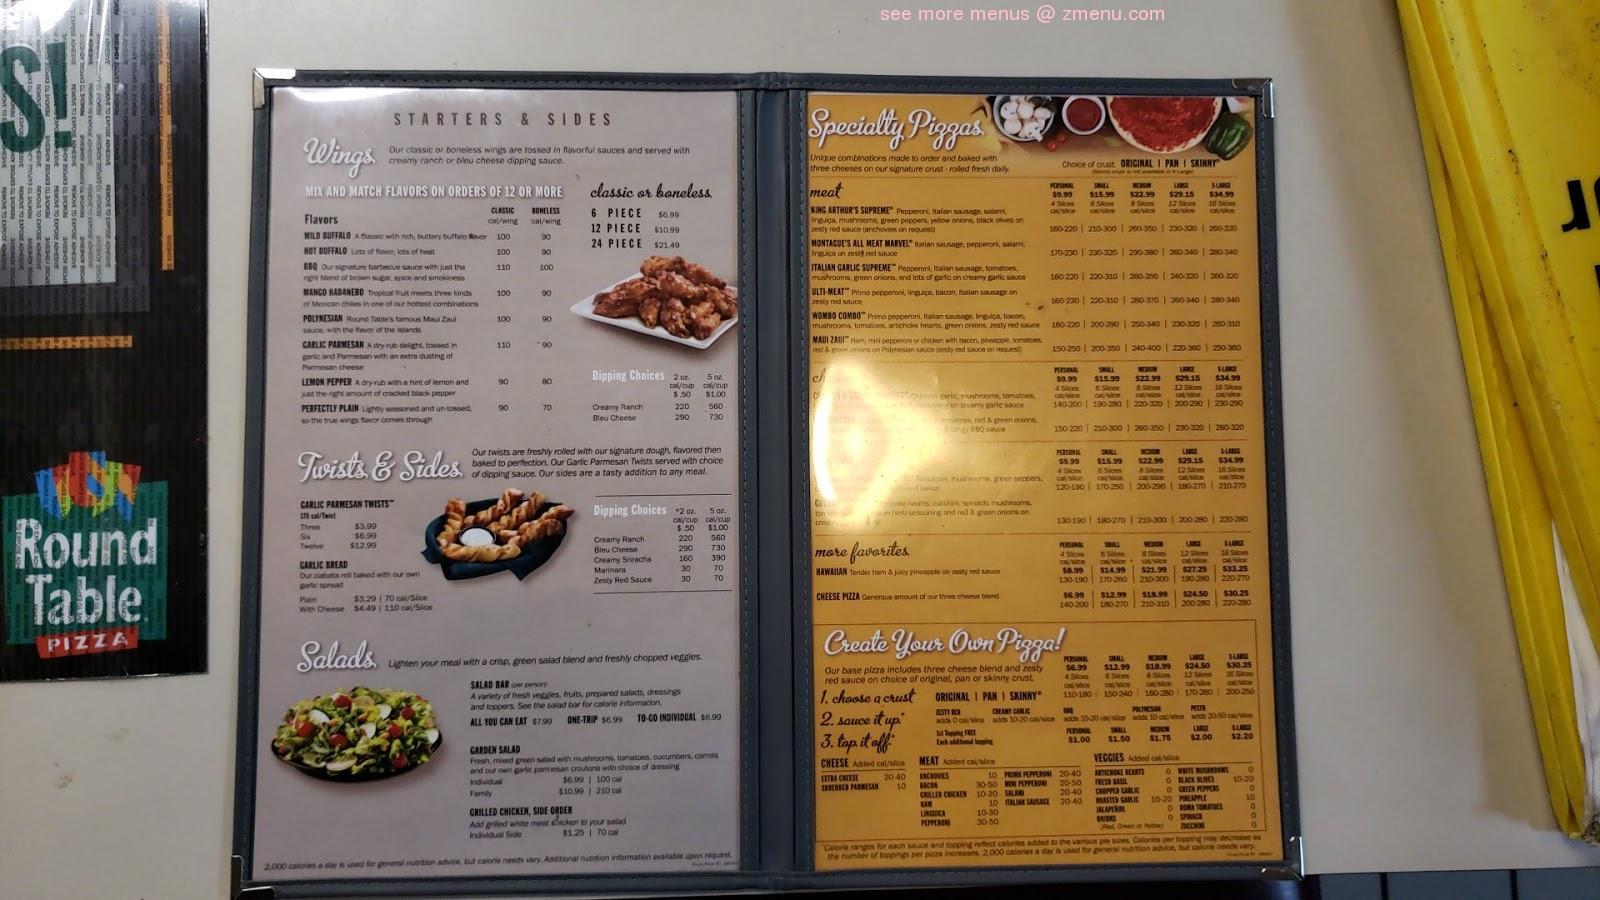 Online Menu Of Round Table Pizza Restaurant Roseville California 95661 Zmenu